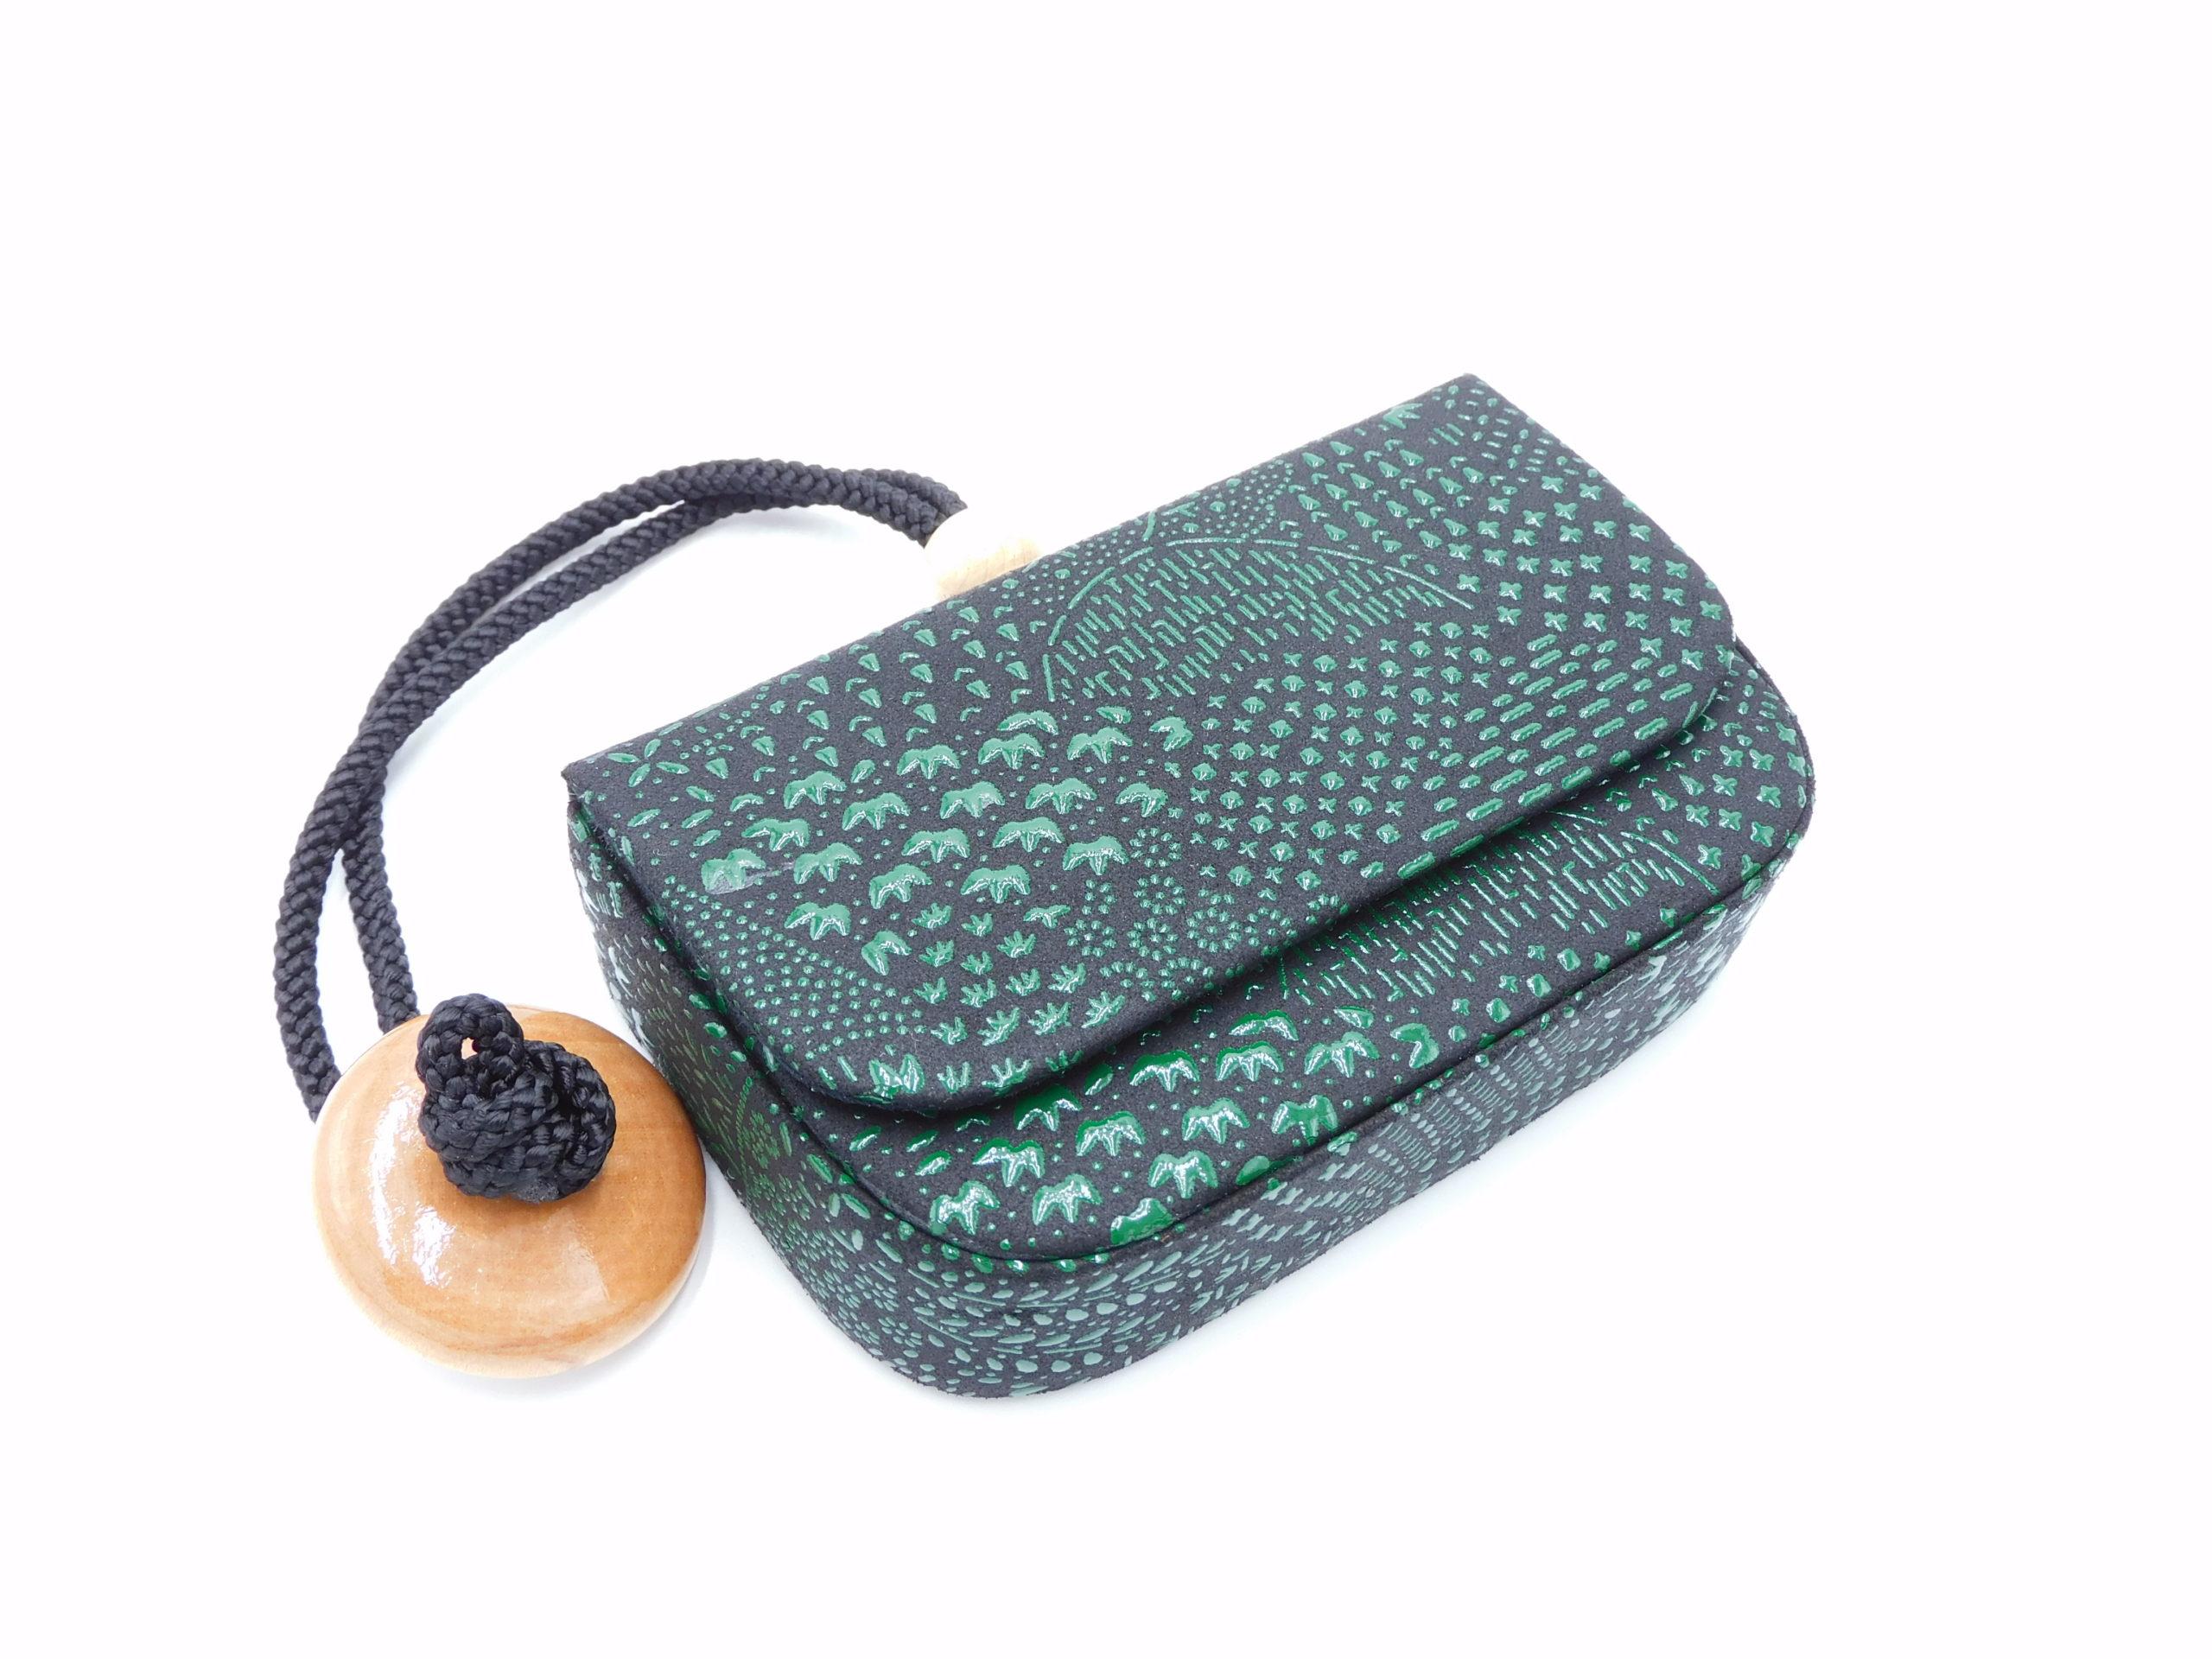 煙草入れ(箱型)叺 黒/緑 寄せ小紋柄